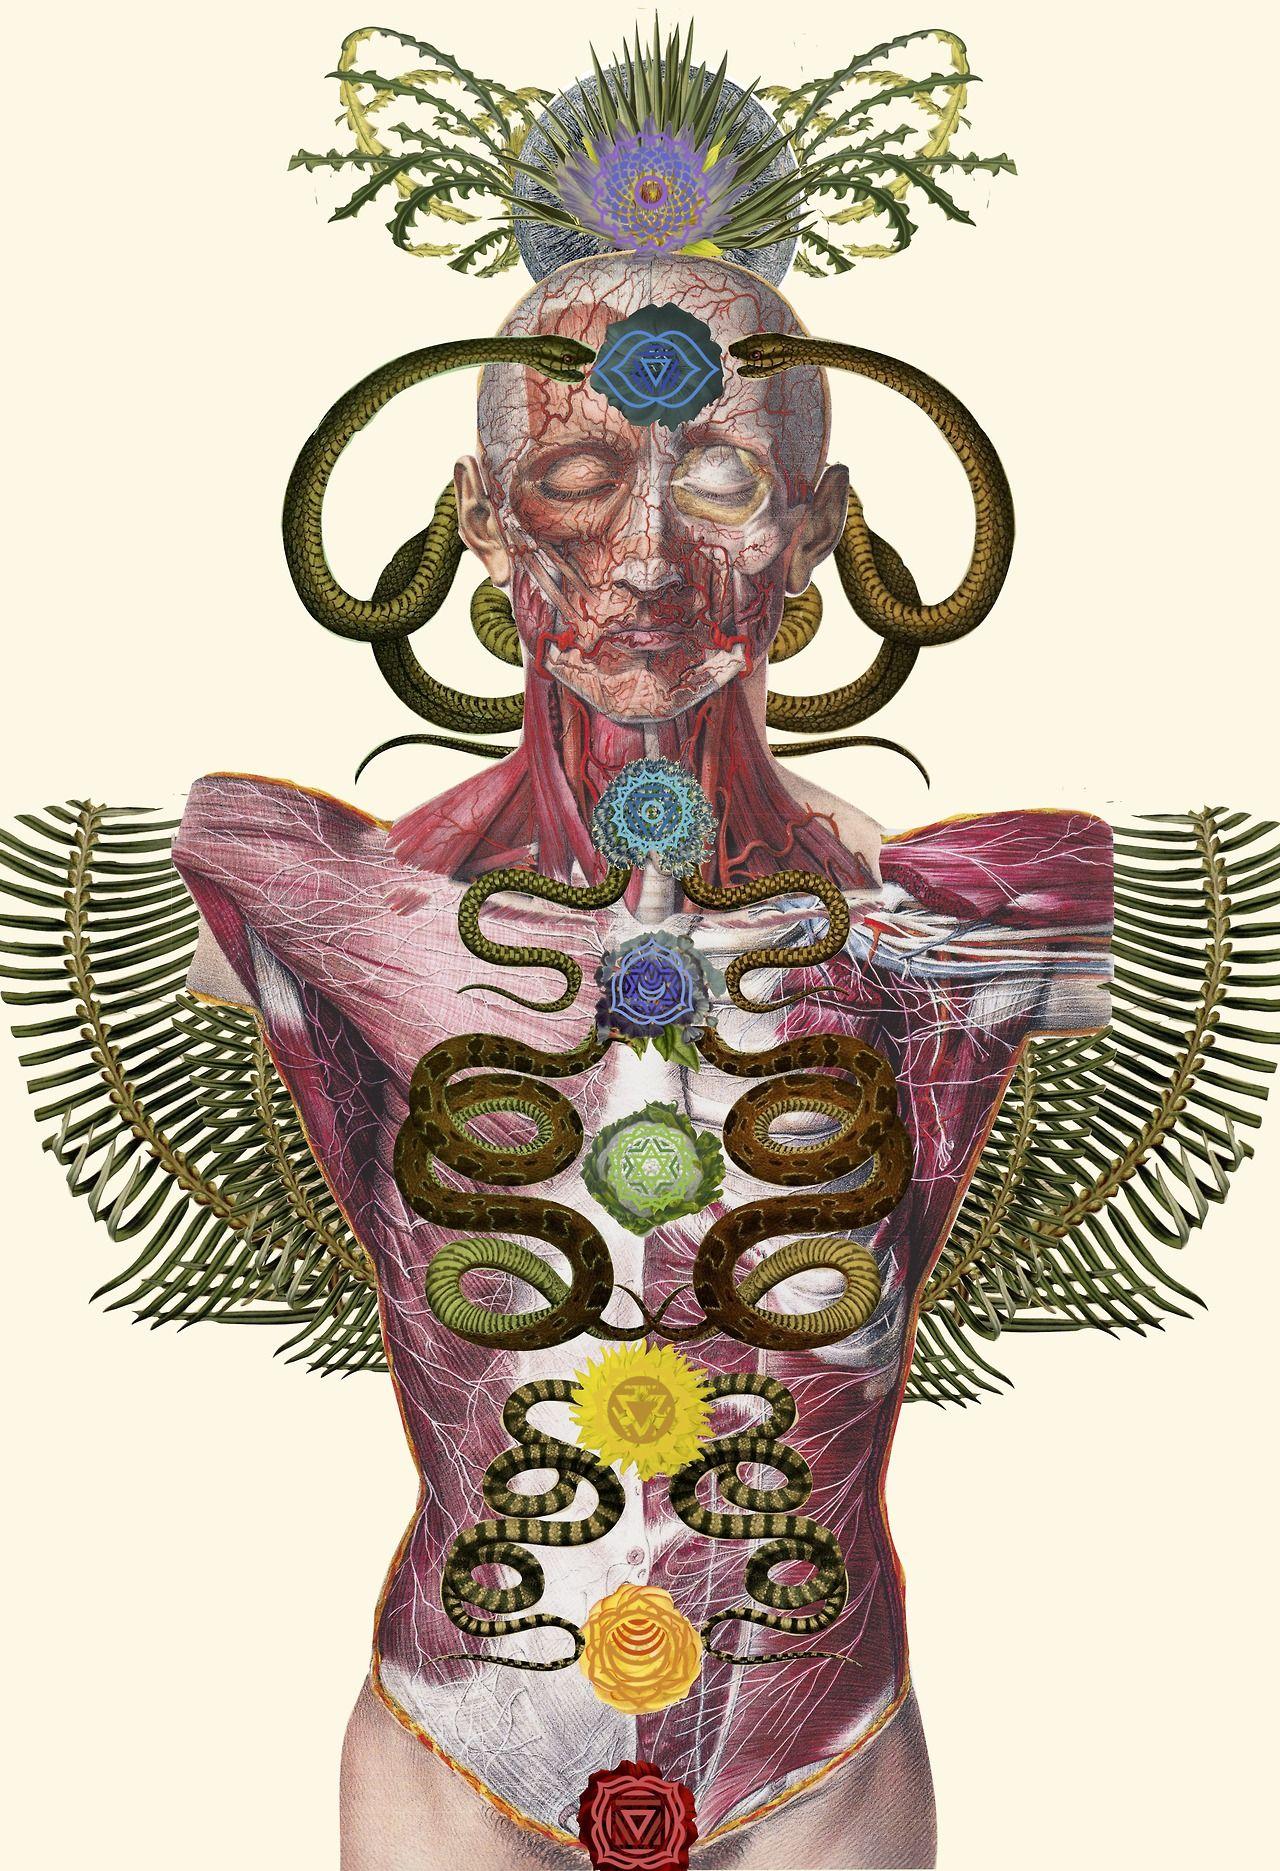 Anatomia Floral nas colagens de Travis Bedel en 2018 | inside out ...